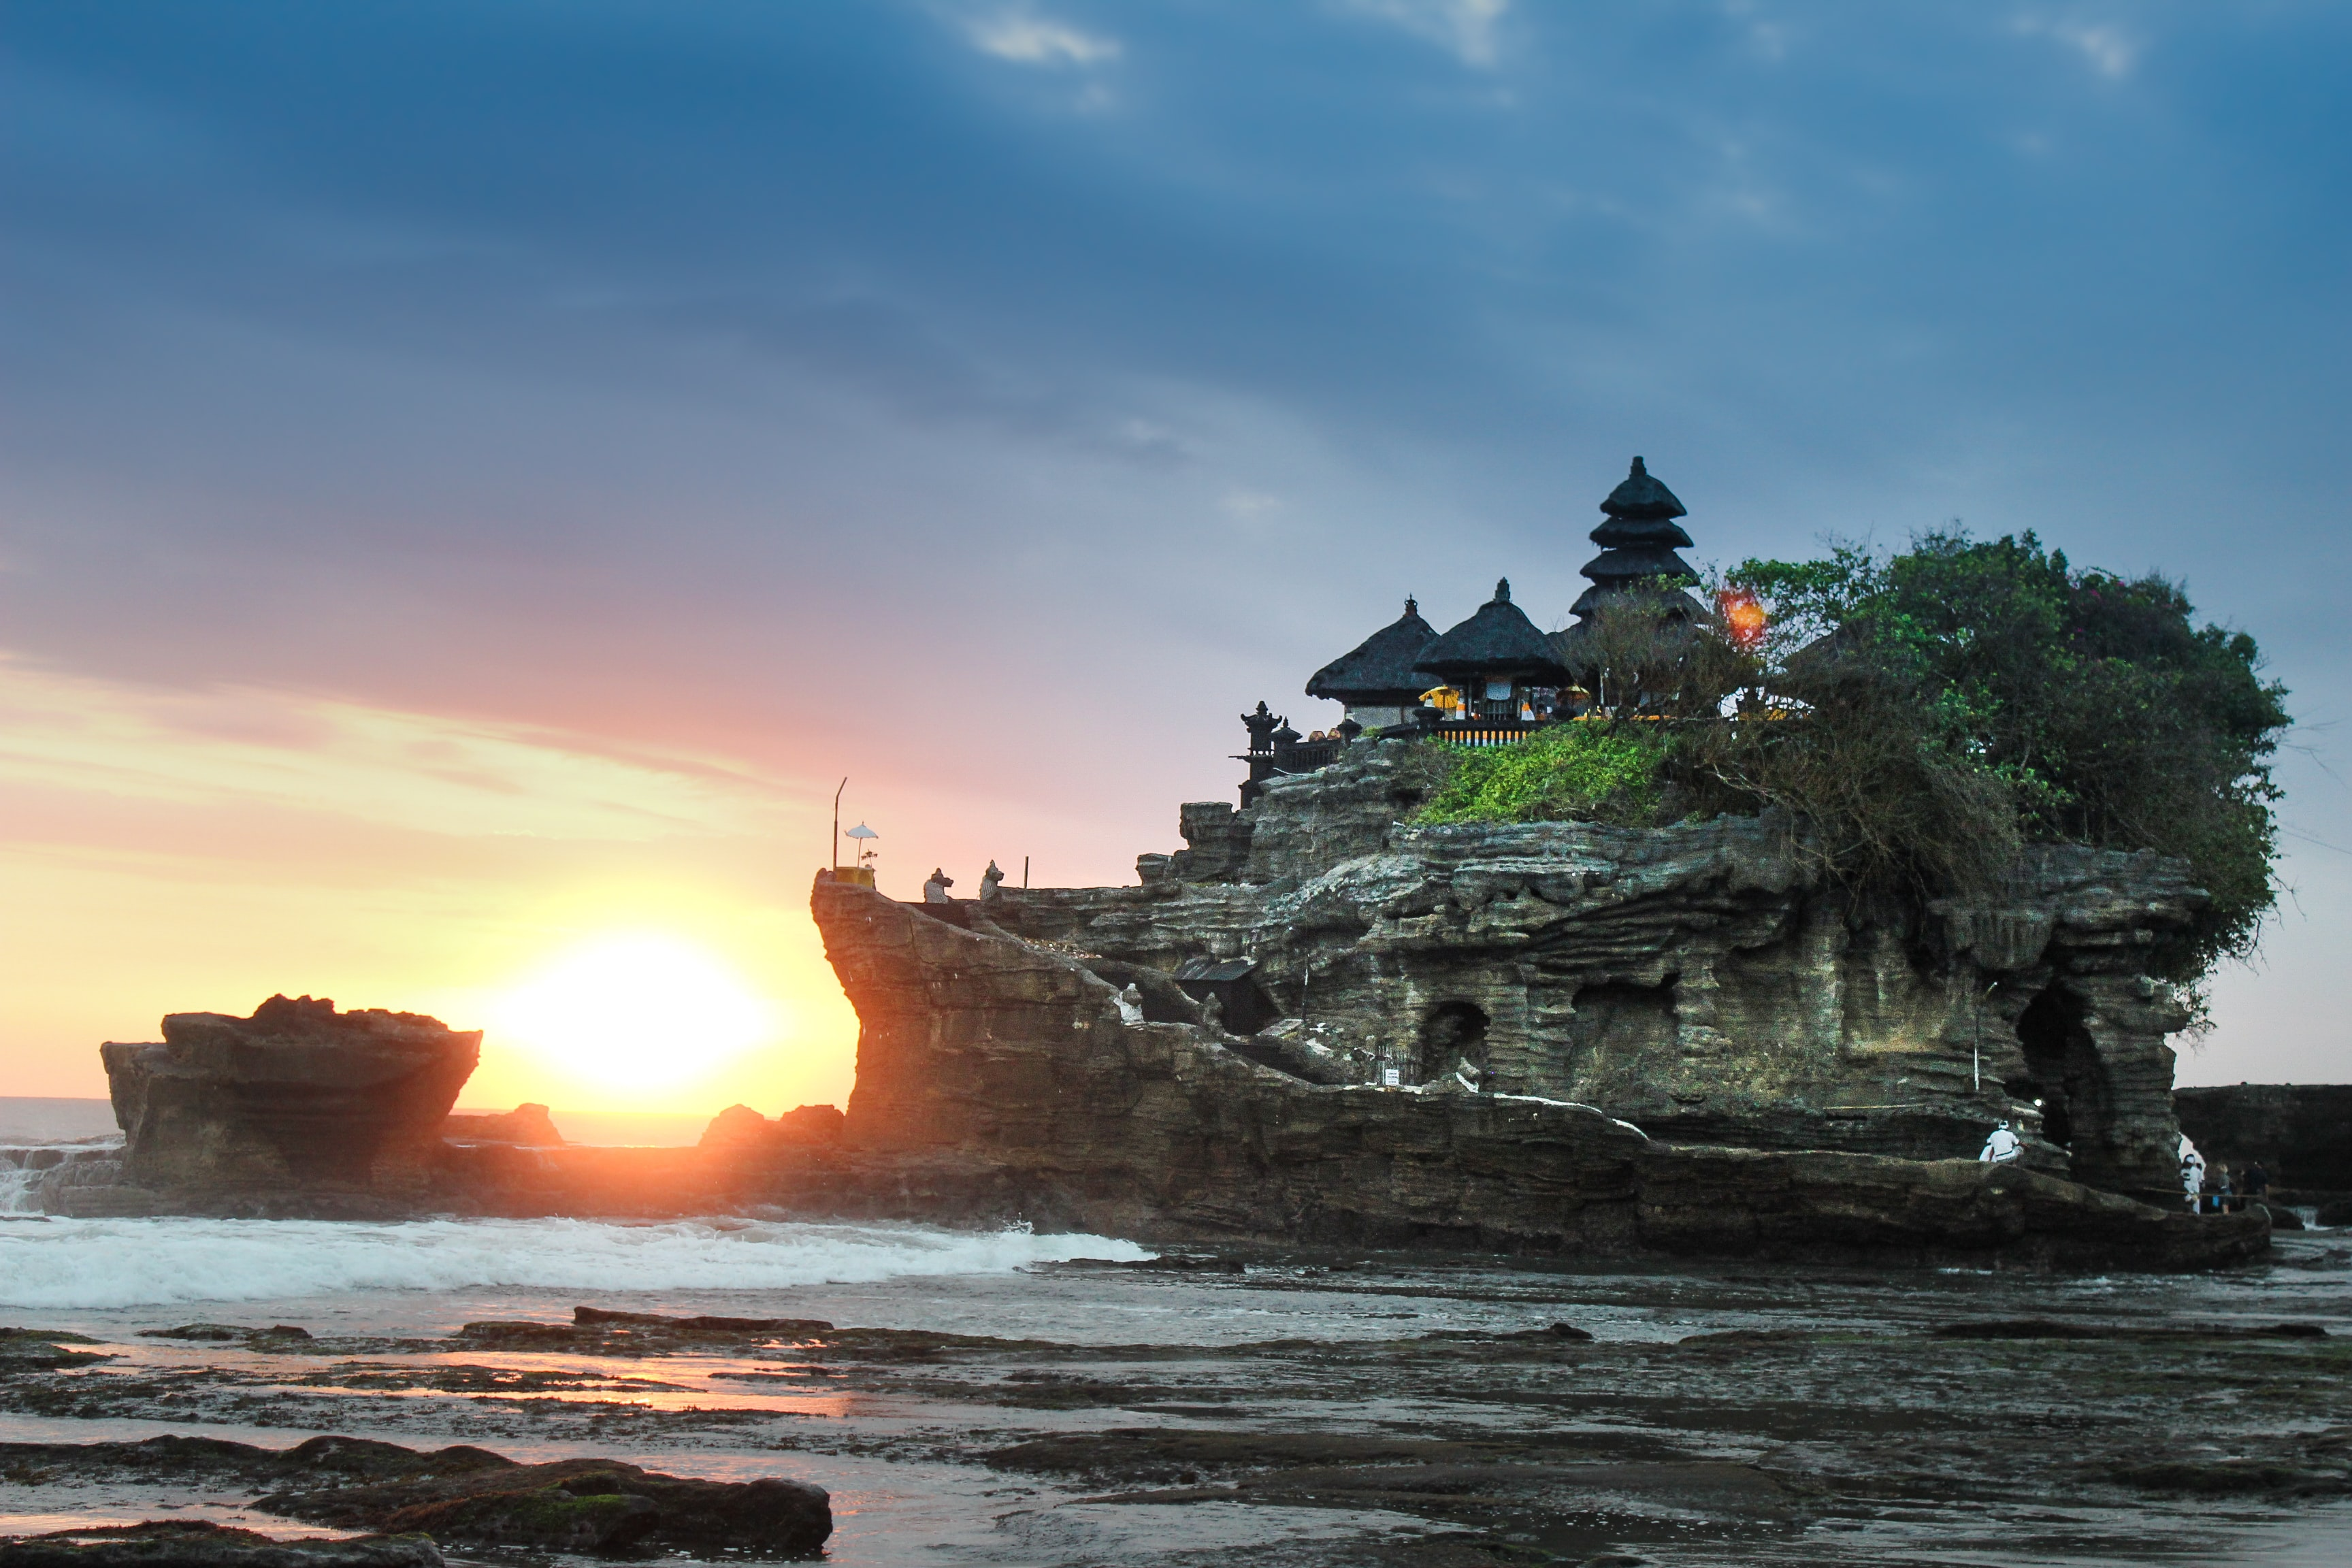 Bali, How to reach Bali from Mumbai?